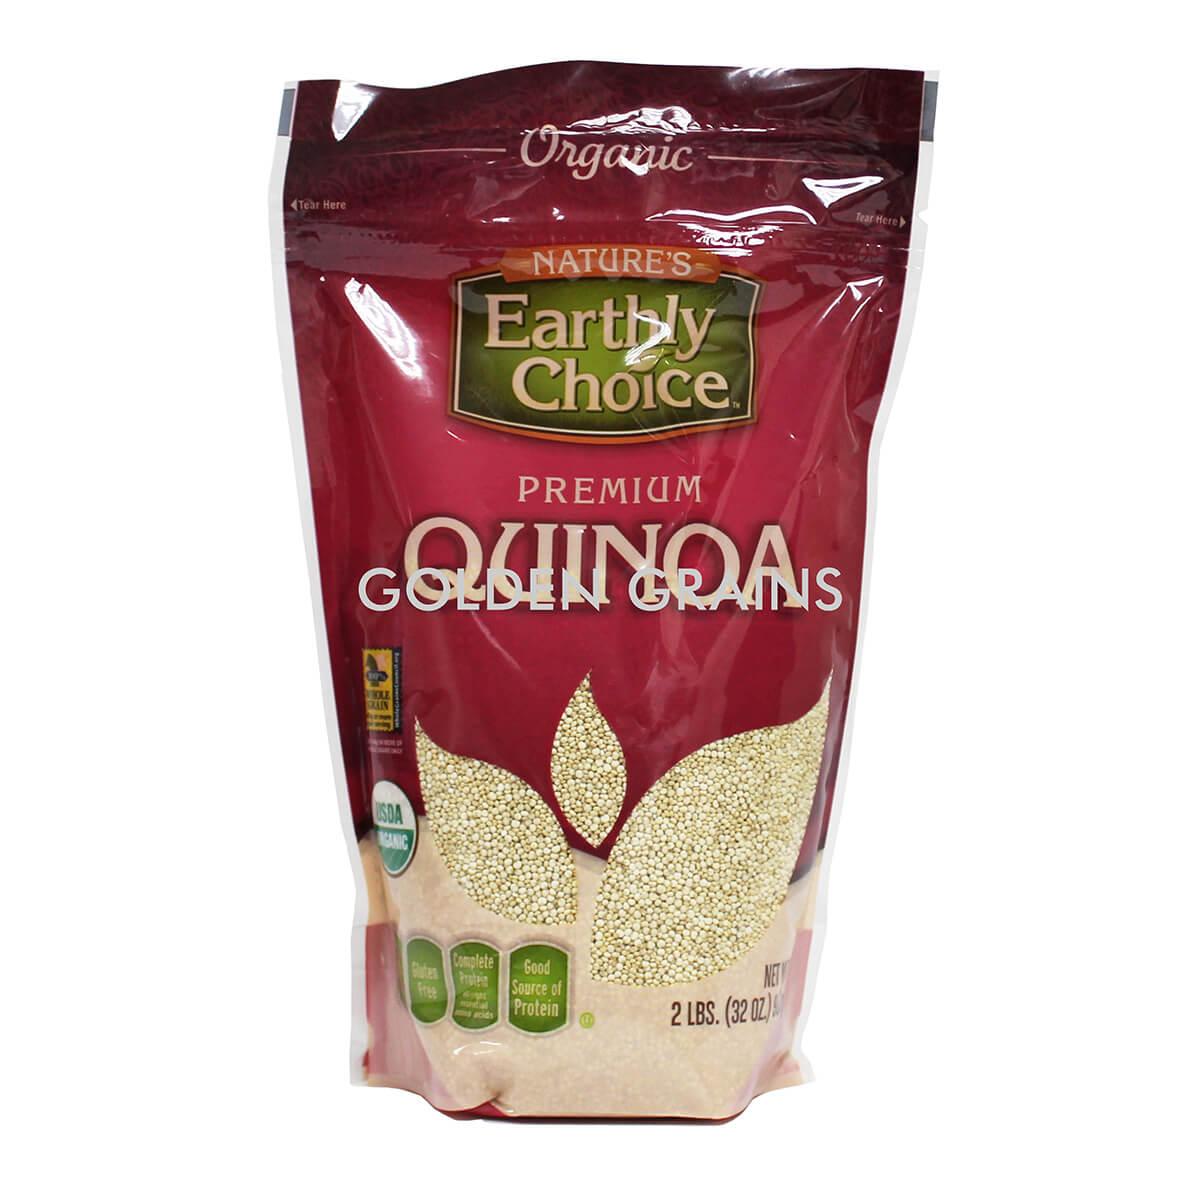 Earthly Choice Quinoa